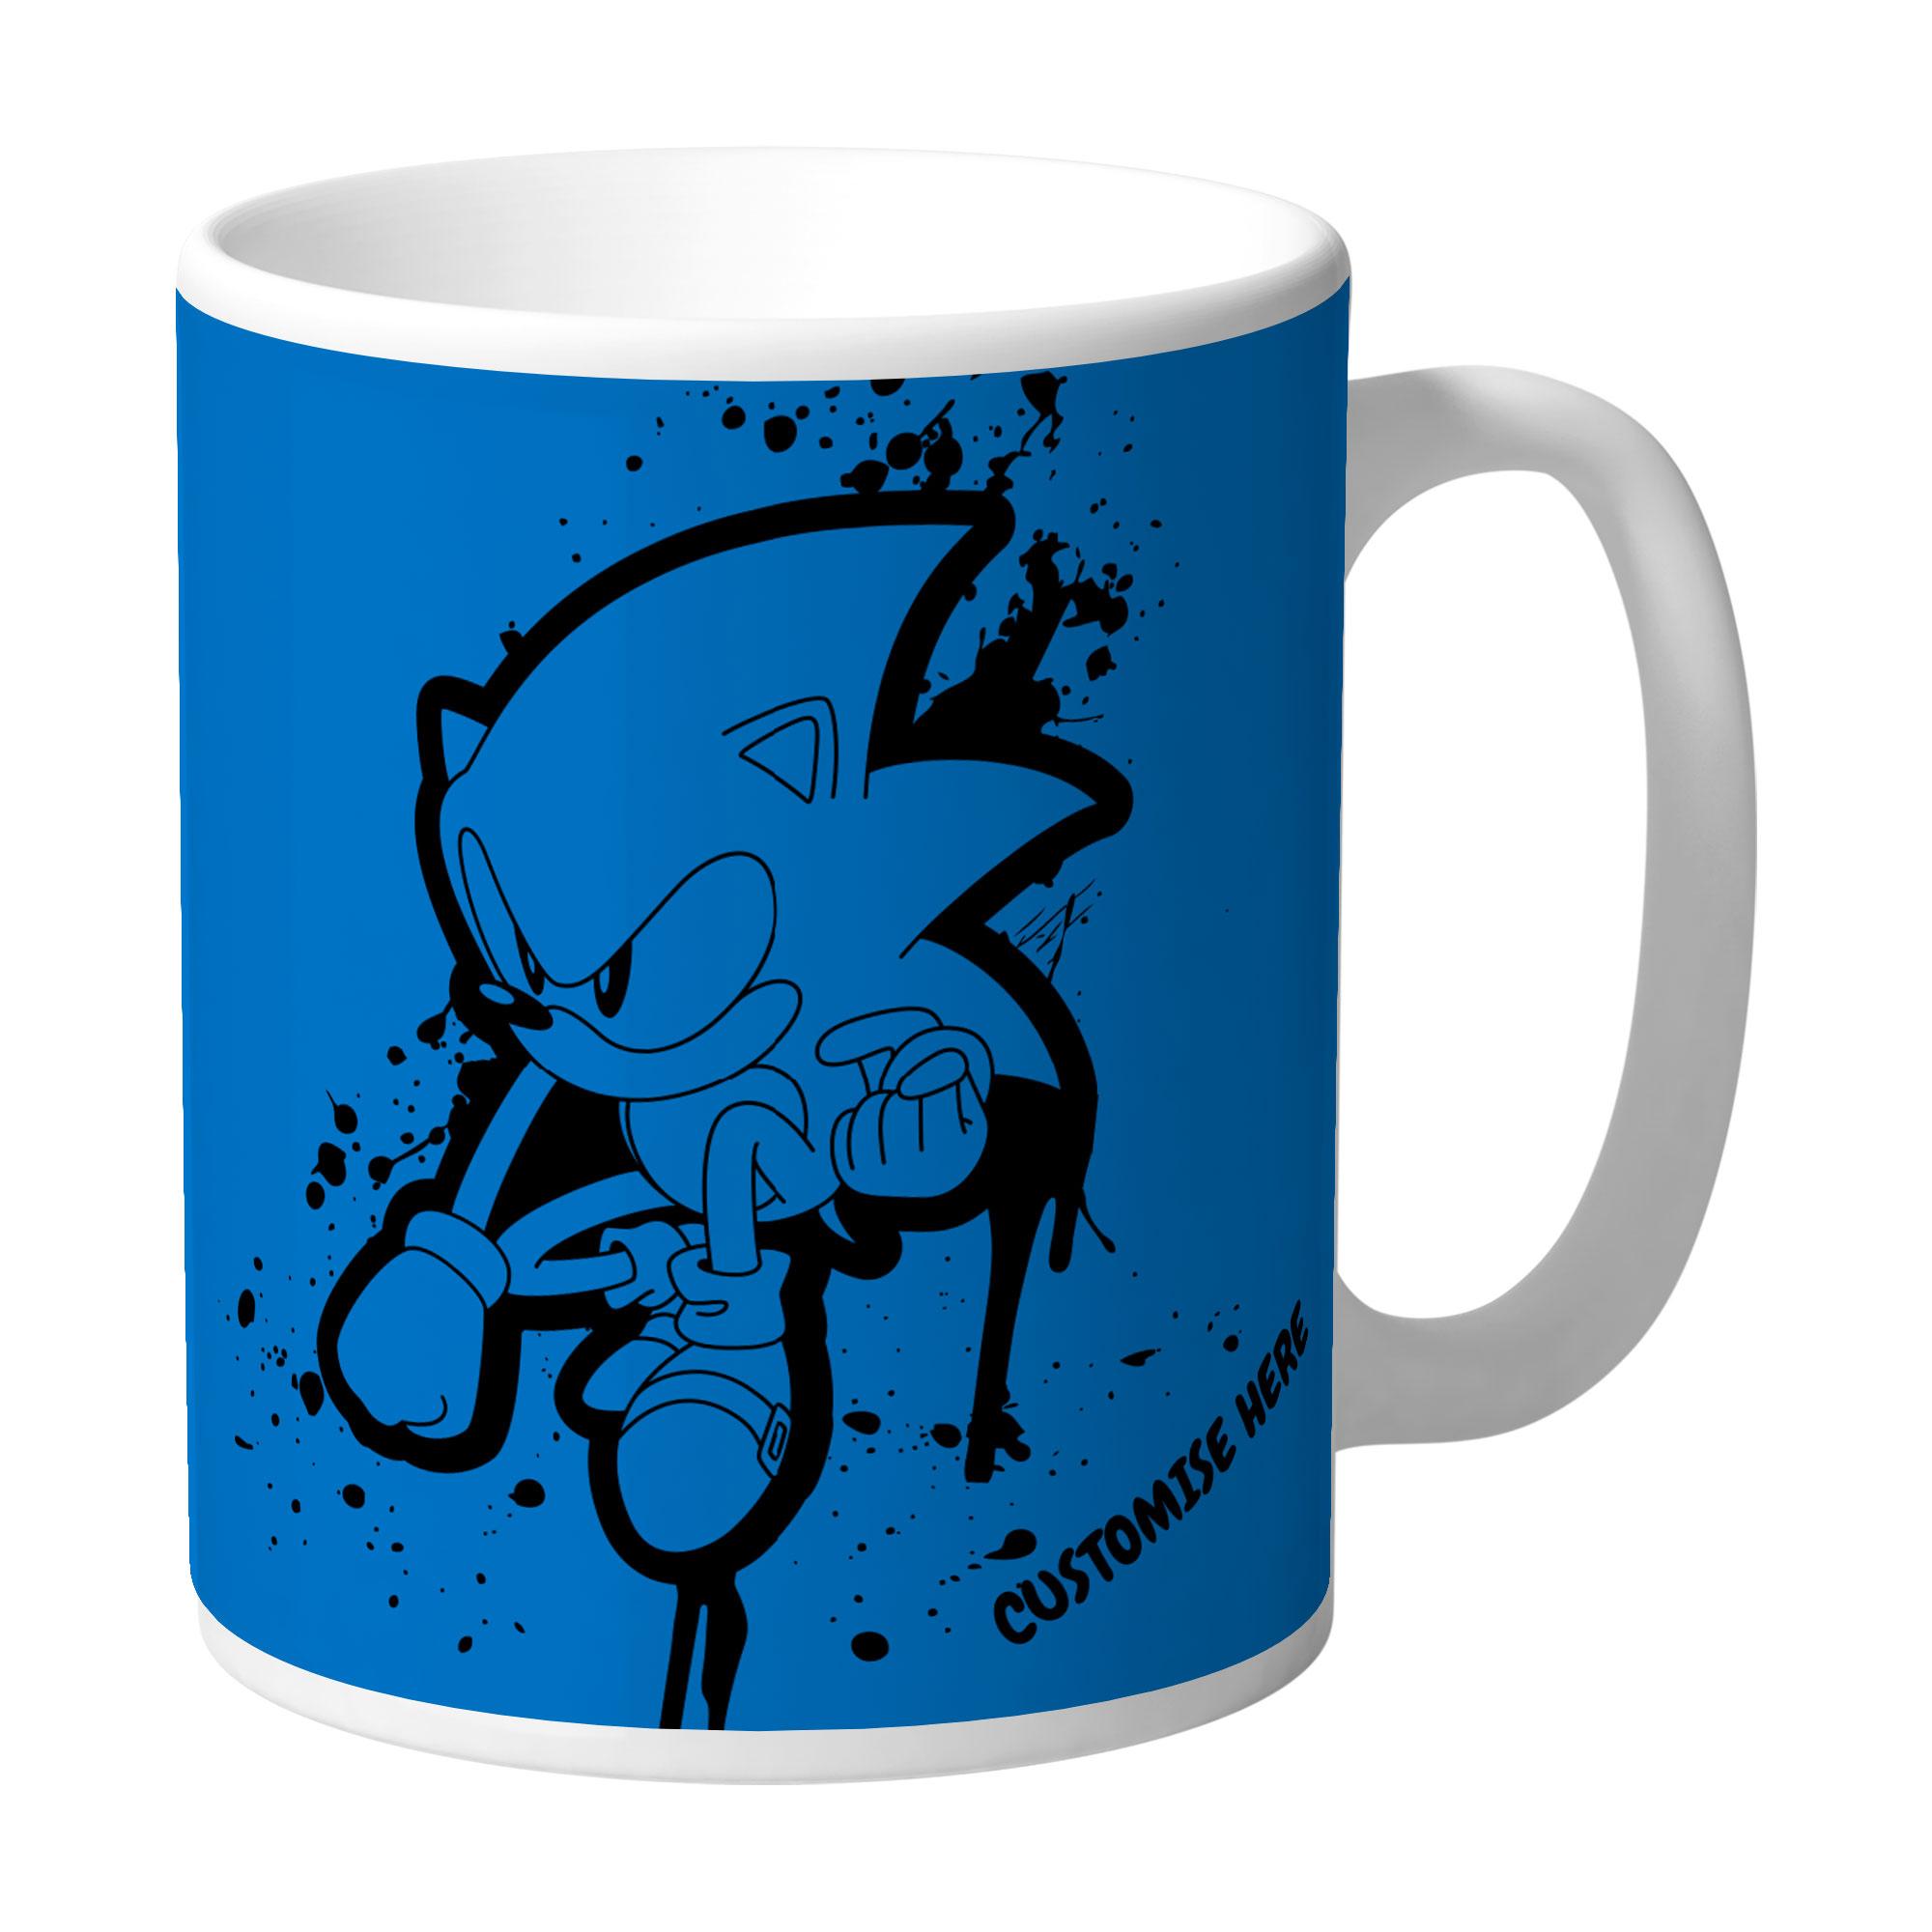 Mug - Graffiti Sonic - Classic Sonic